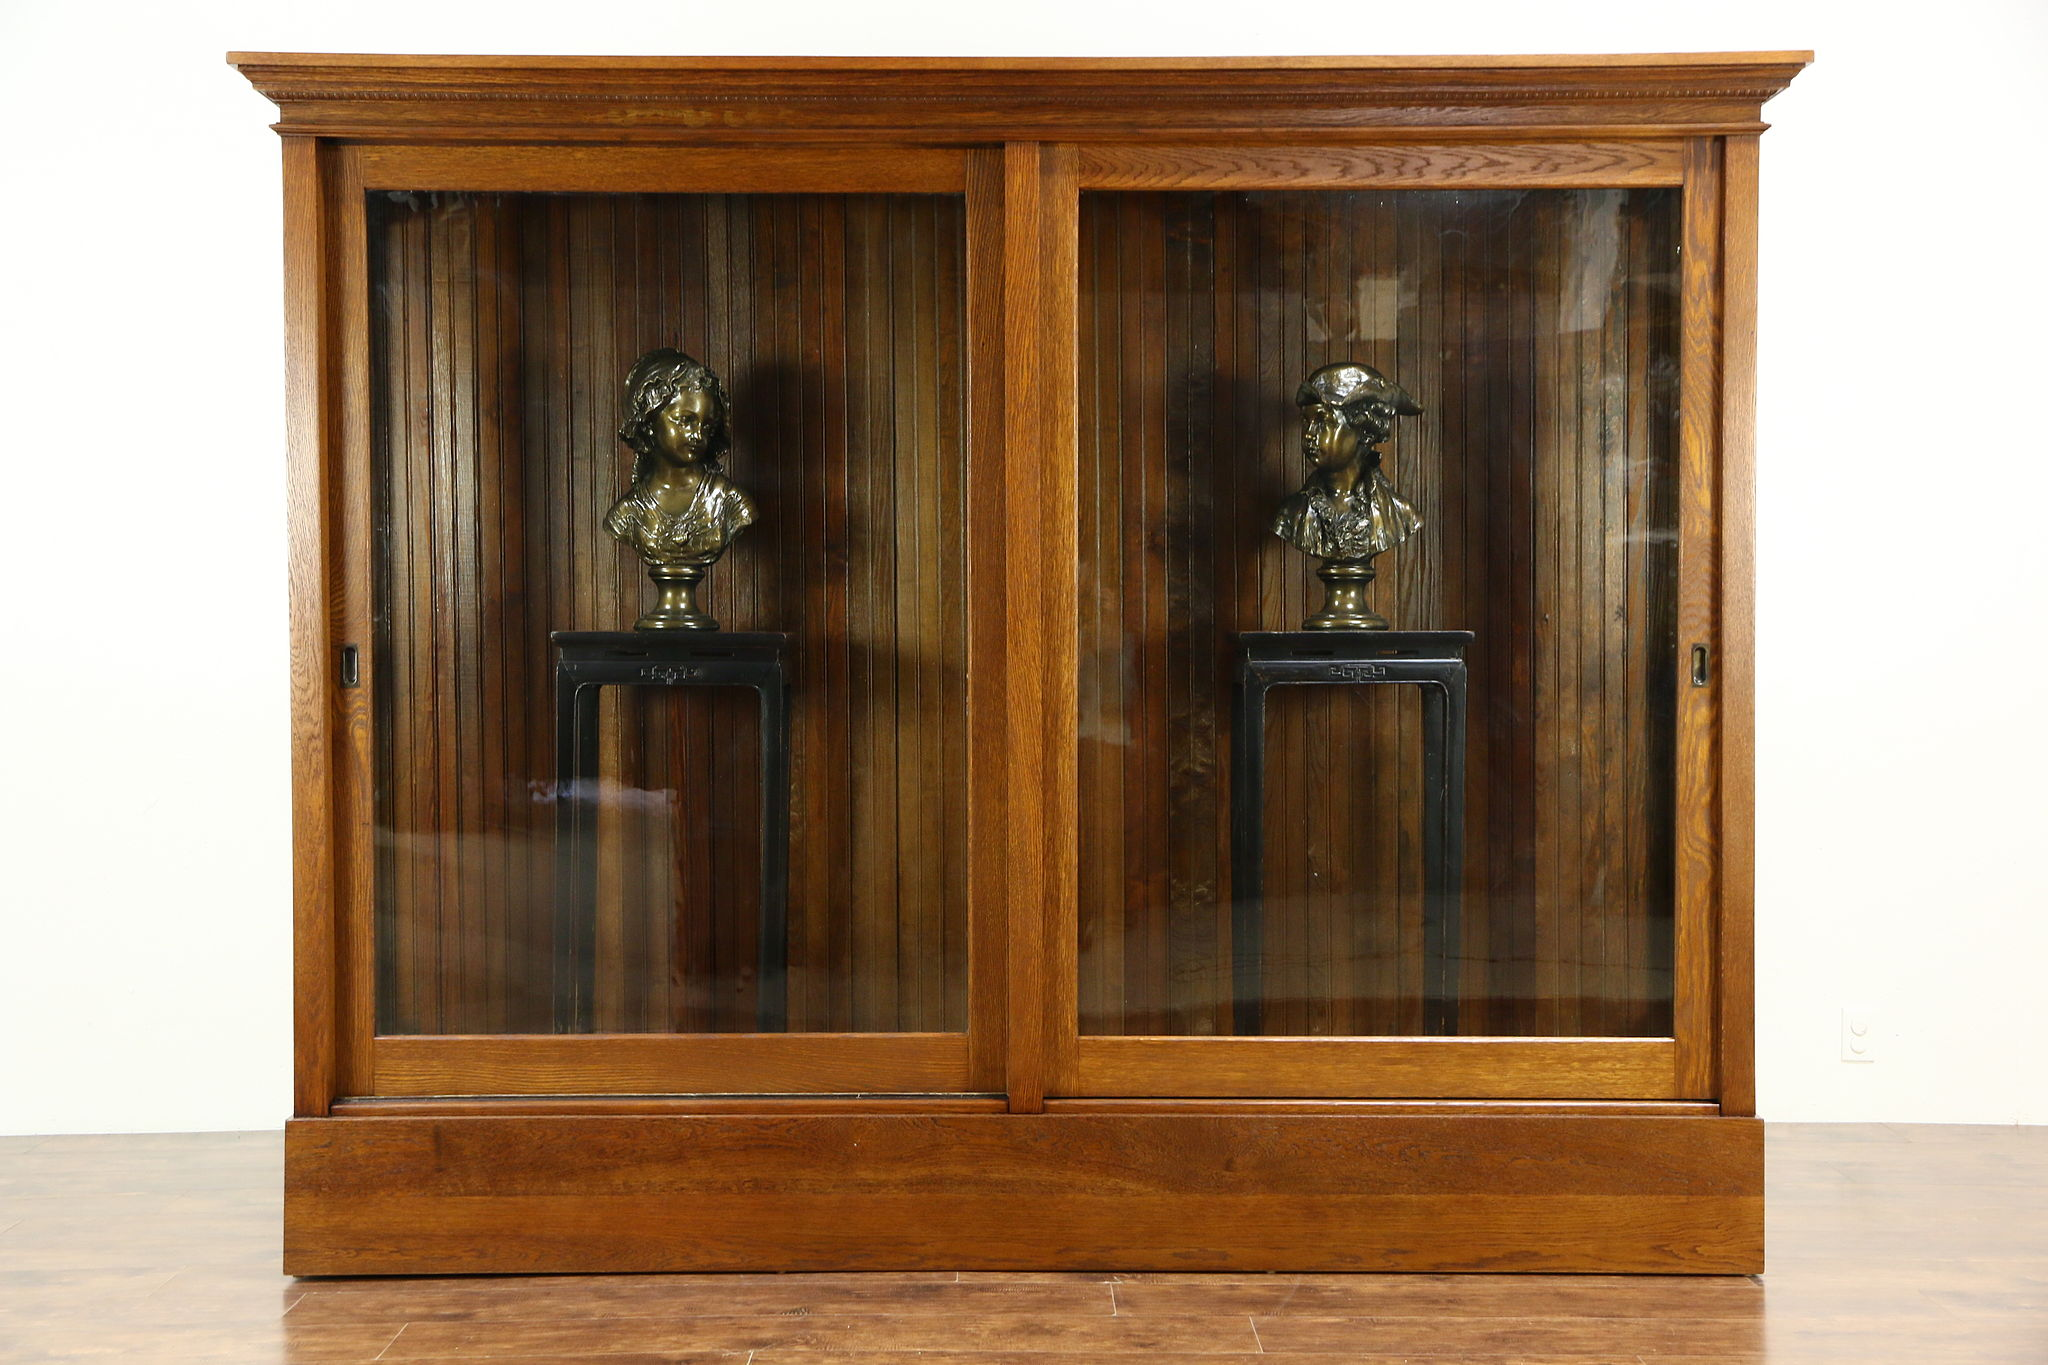 Oak 1900 Antique Display Cabinet Pantry Cupboard Sliding Glass Doors